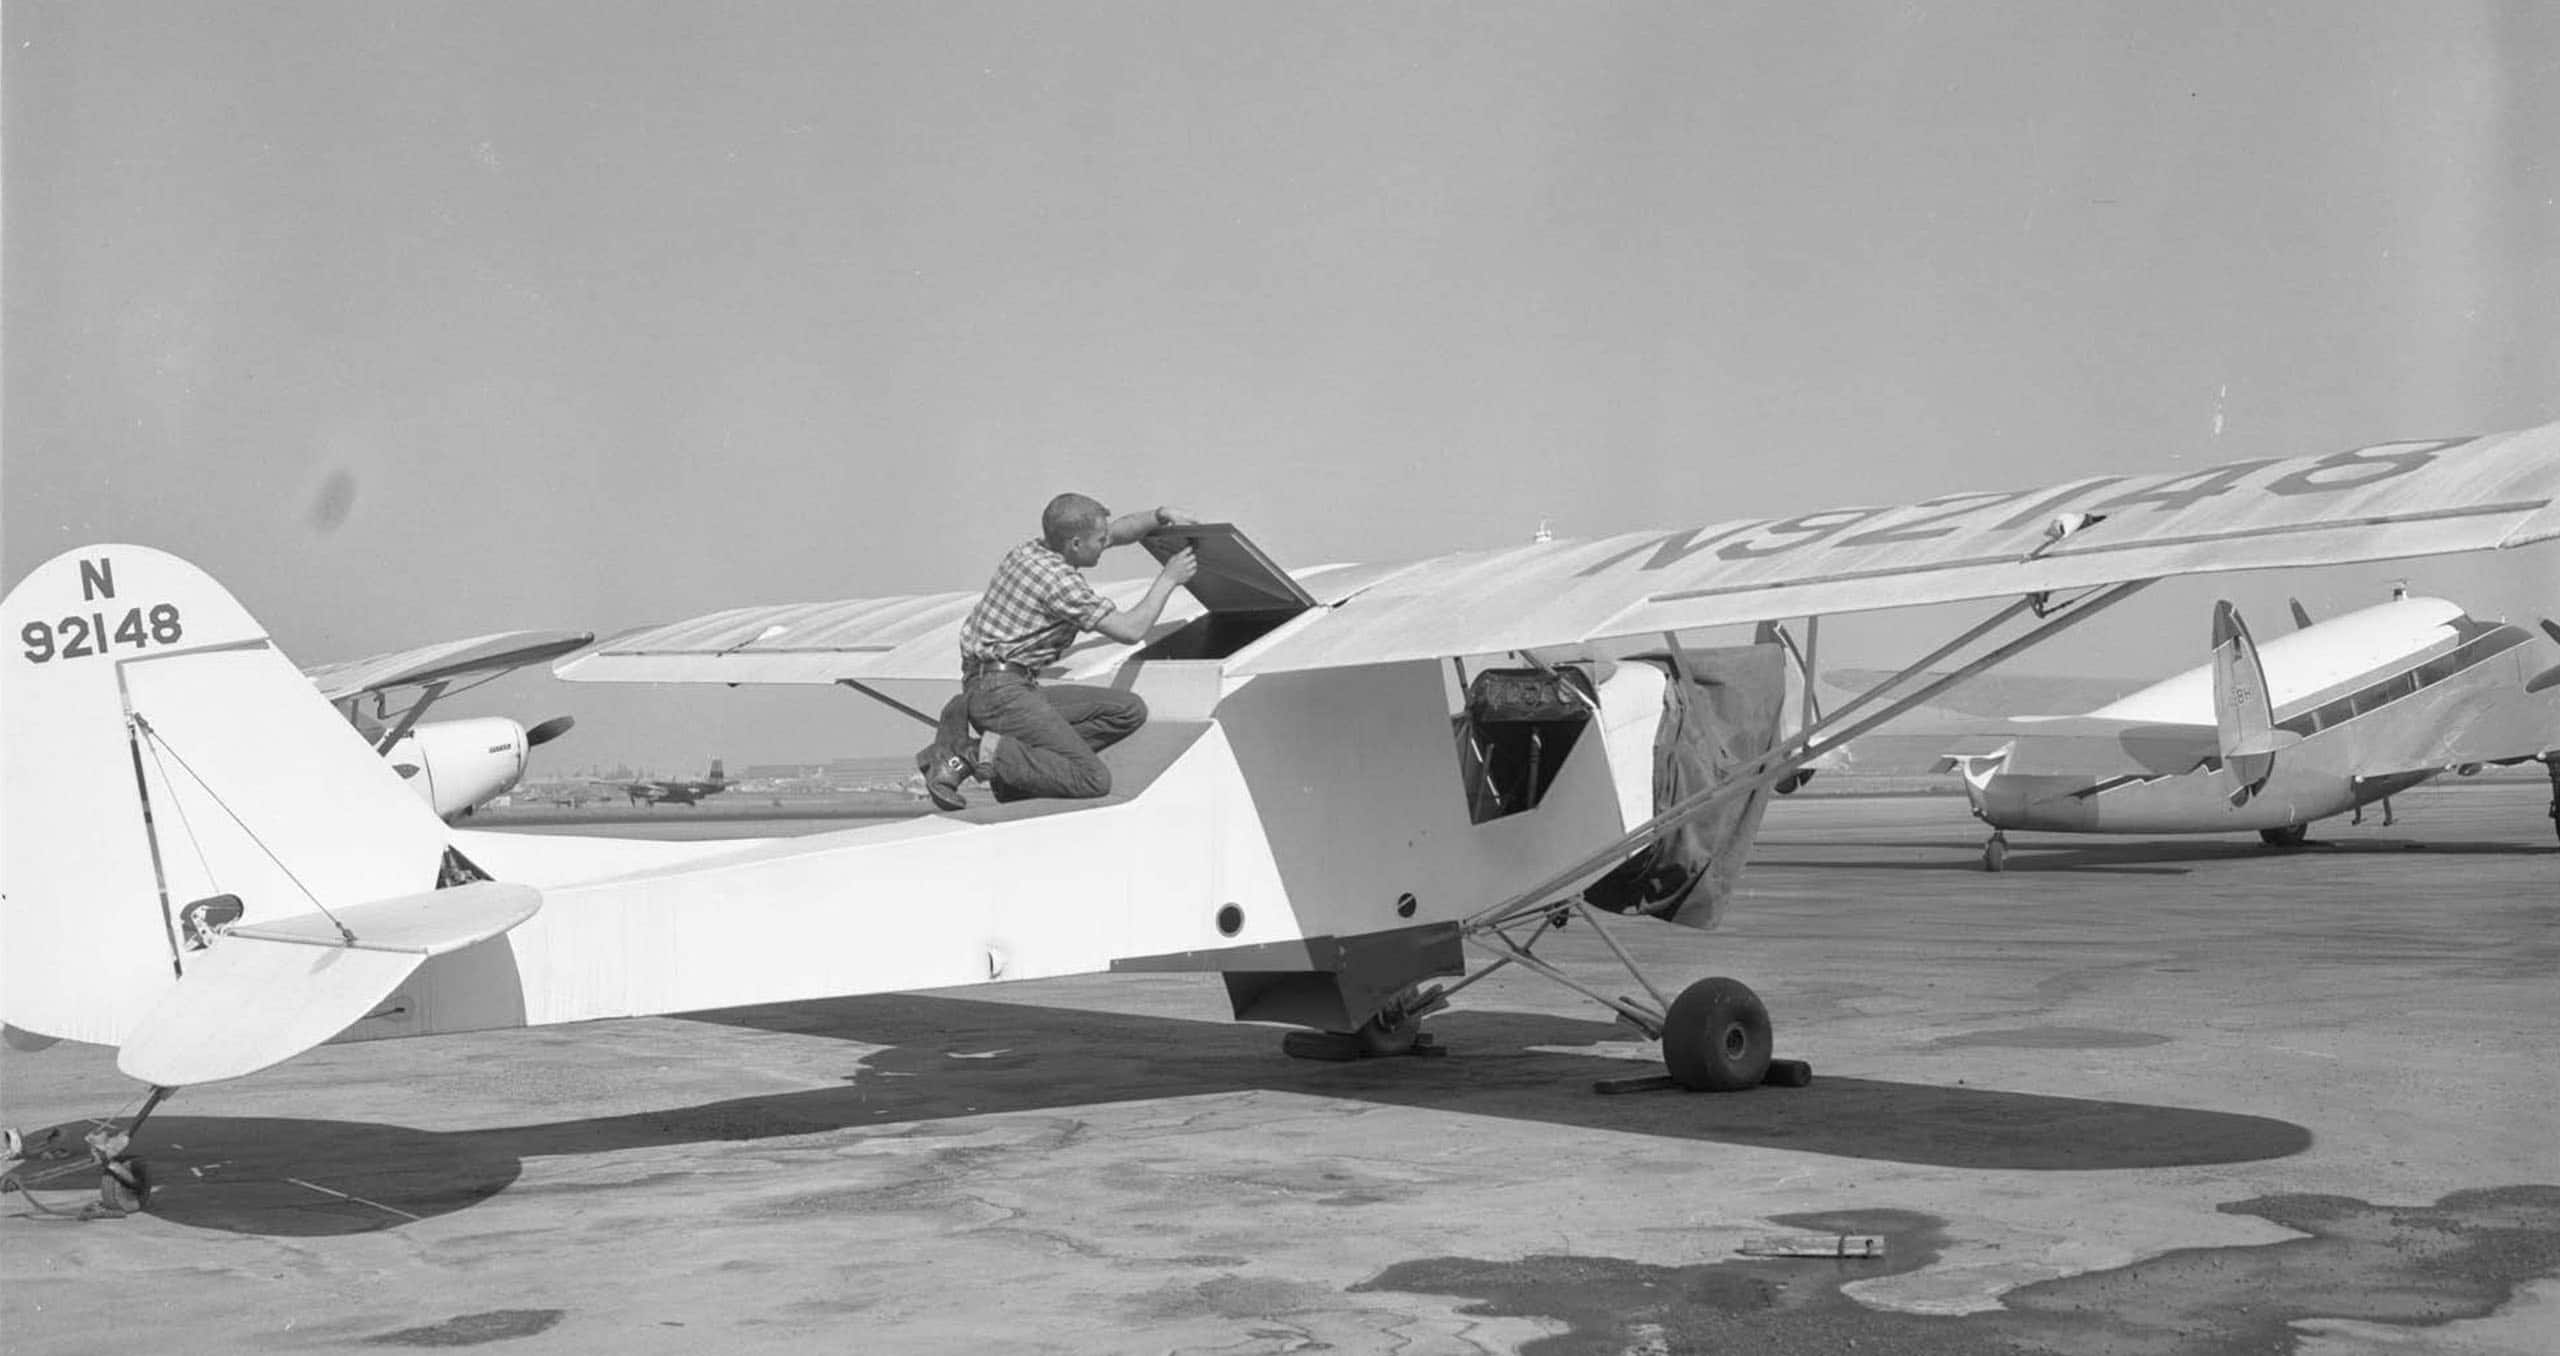 Man working on airplane long beach airport